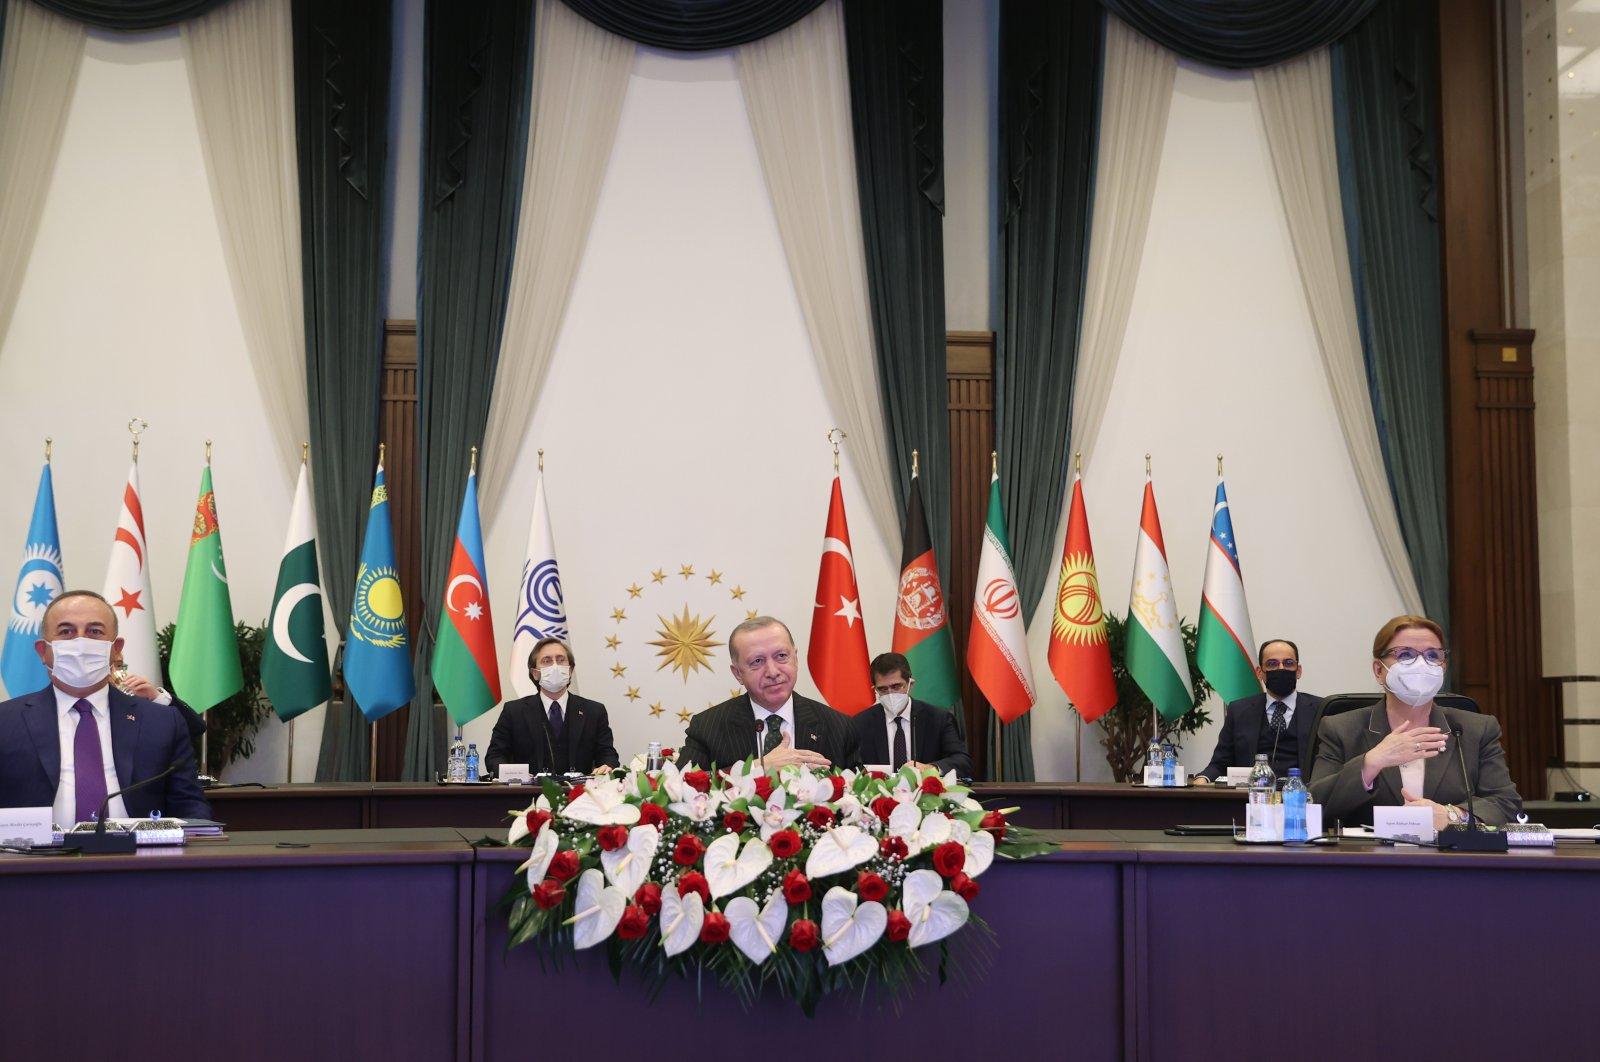 President Recep Tayyip Erdoğan during Economic Cooperation Organization (ECO) 14th Leaders Summit, March 4, 2021. (AA Photo)